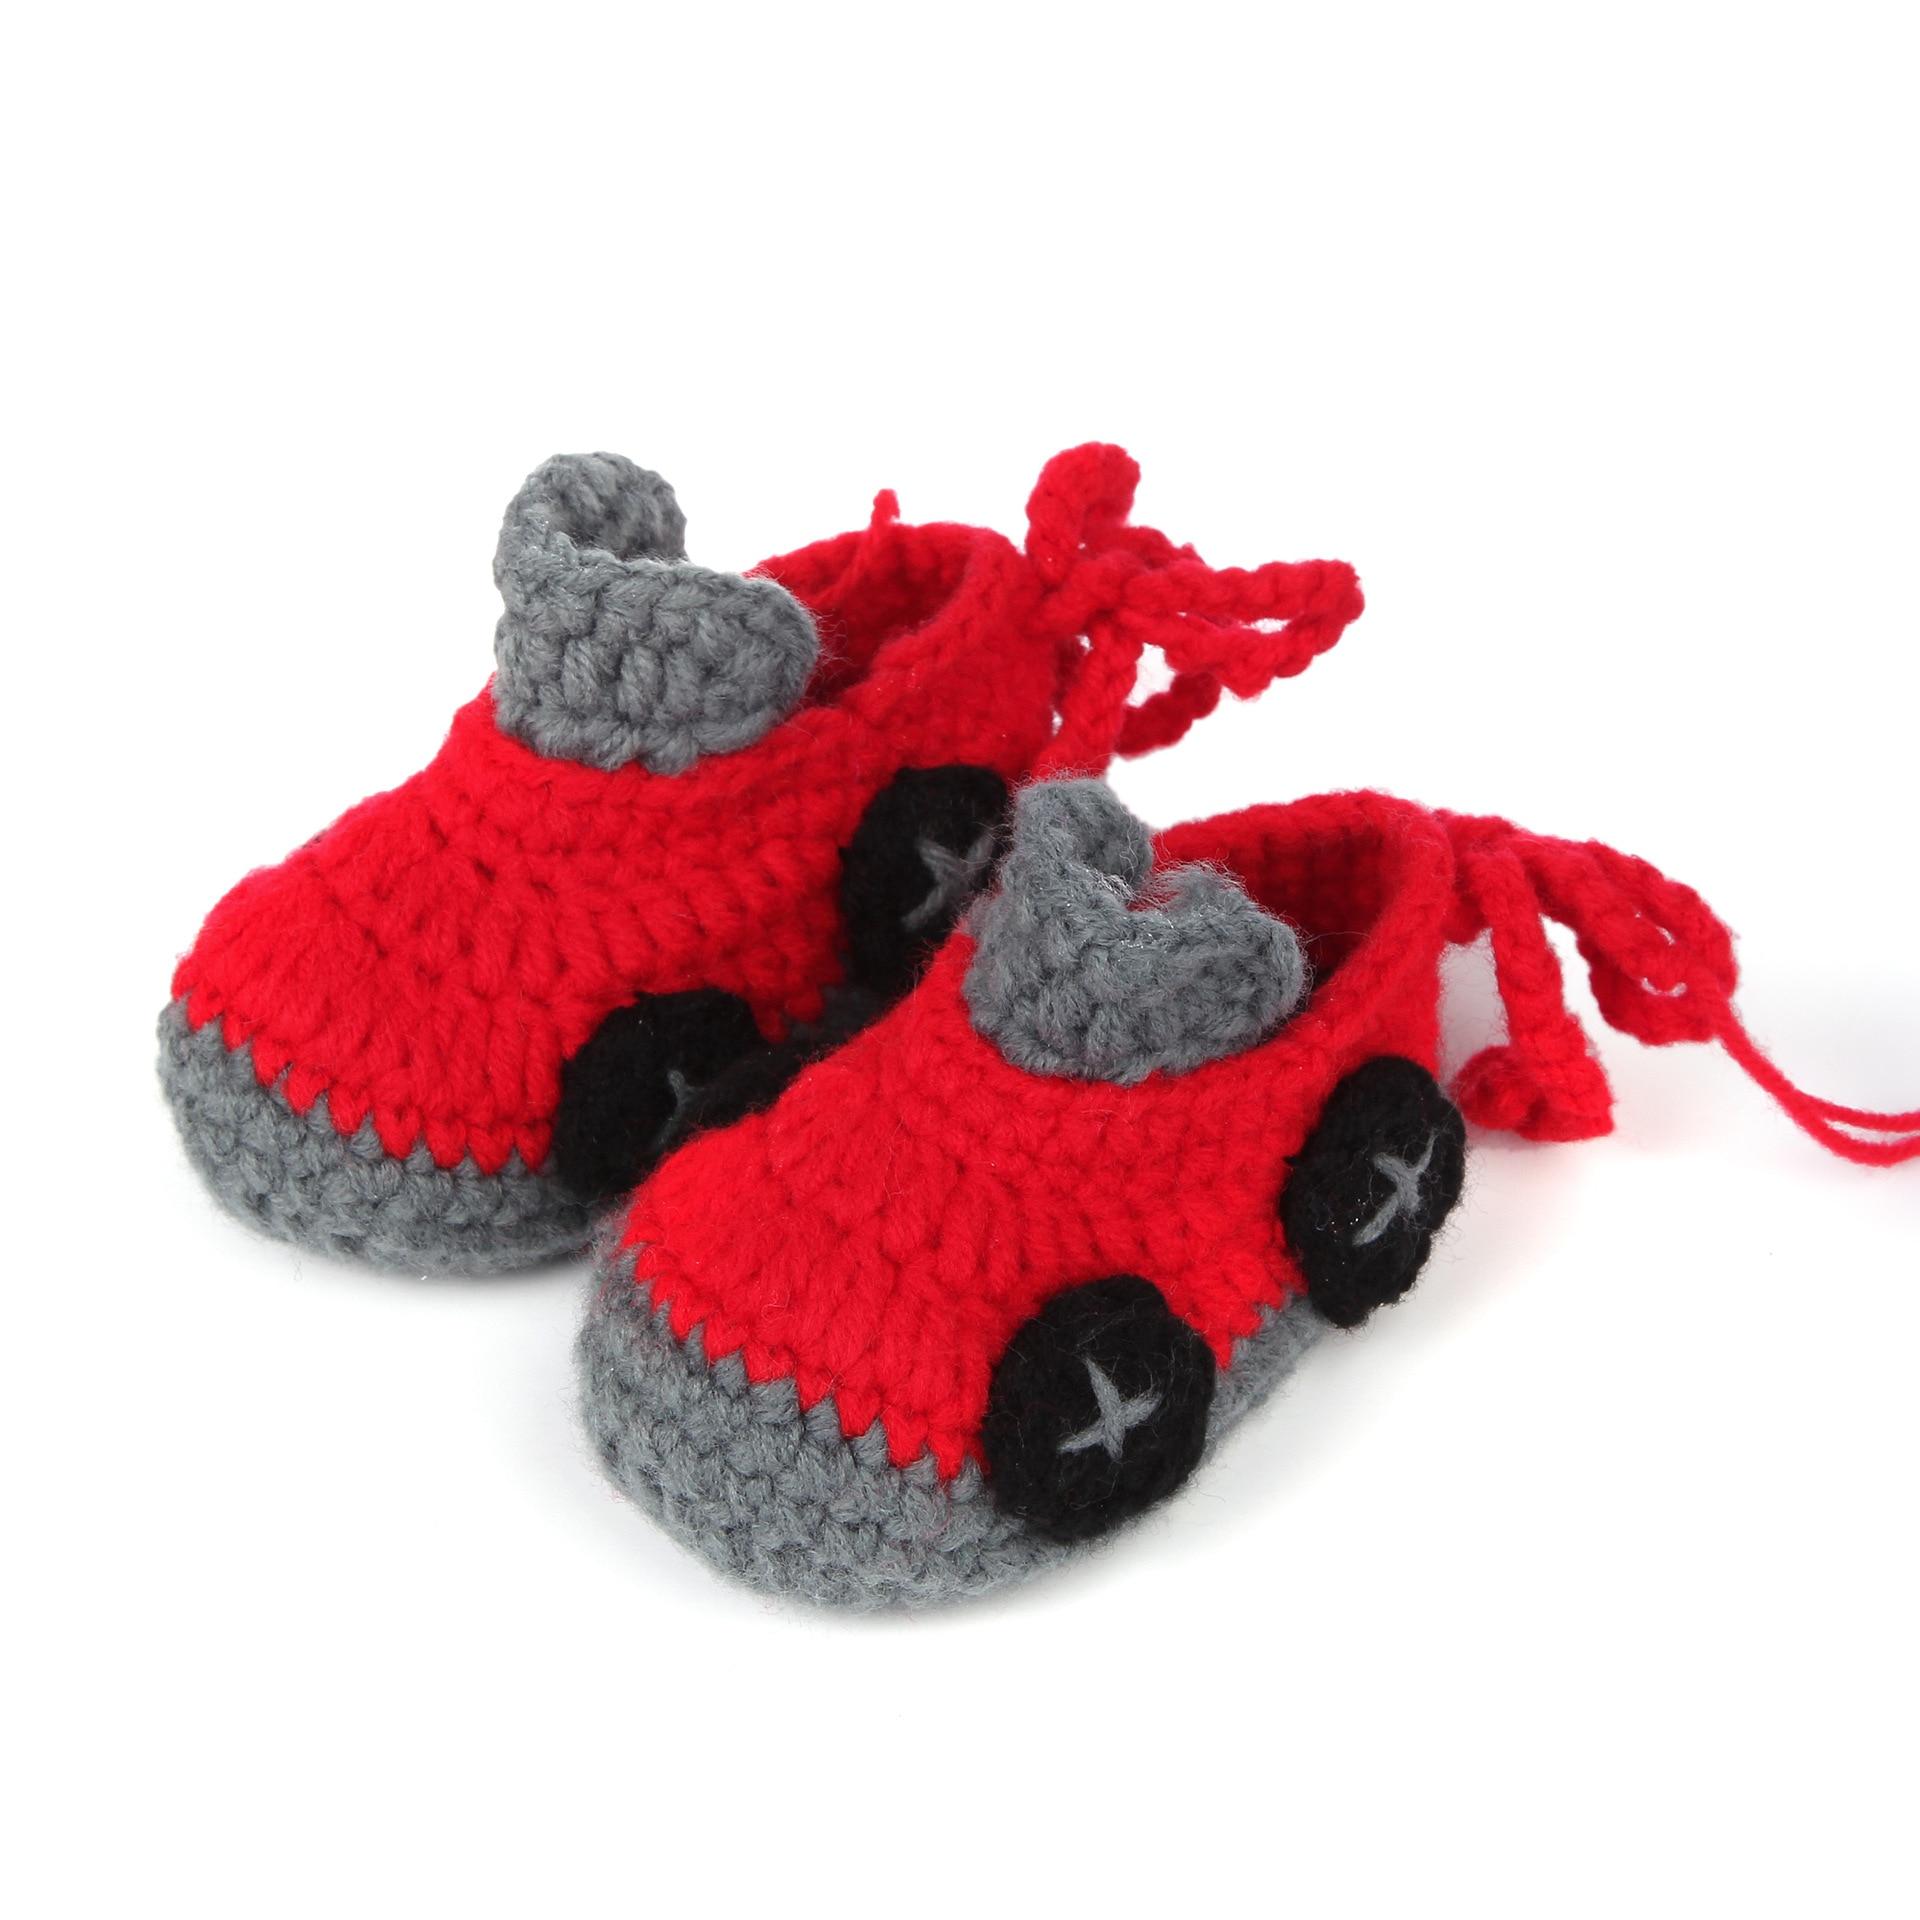 DOGEEK Unisex Newborn First Walkers Cute Crib Shoes Girl Boy Handmade Knit Sock Shoes Baby Crochet Knit Toddler Shoes Infant